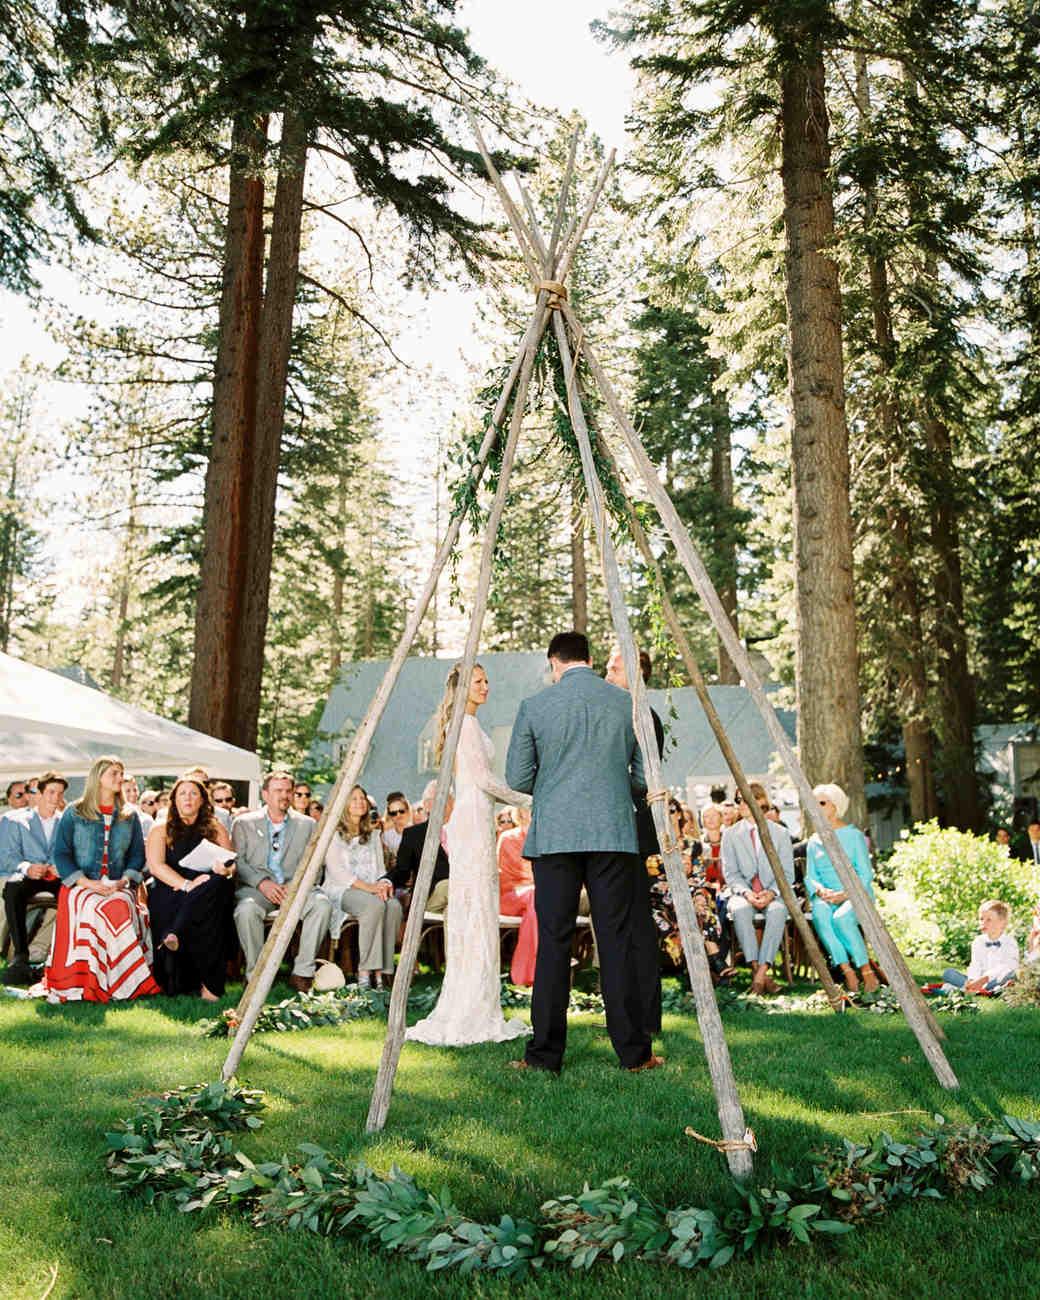 wedding ceremony with teepee